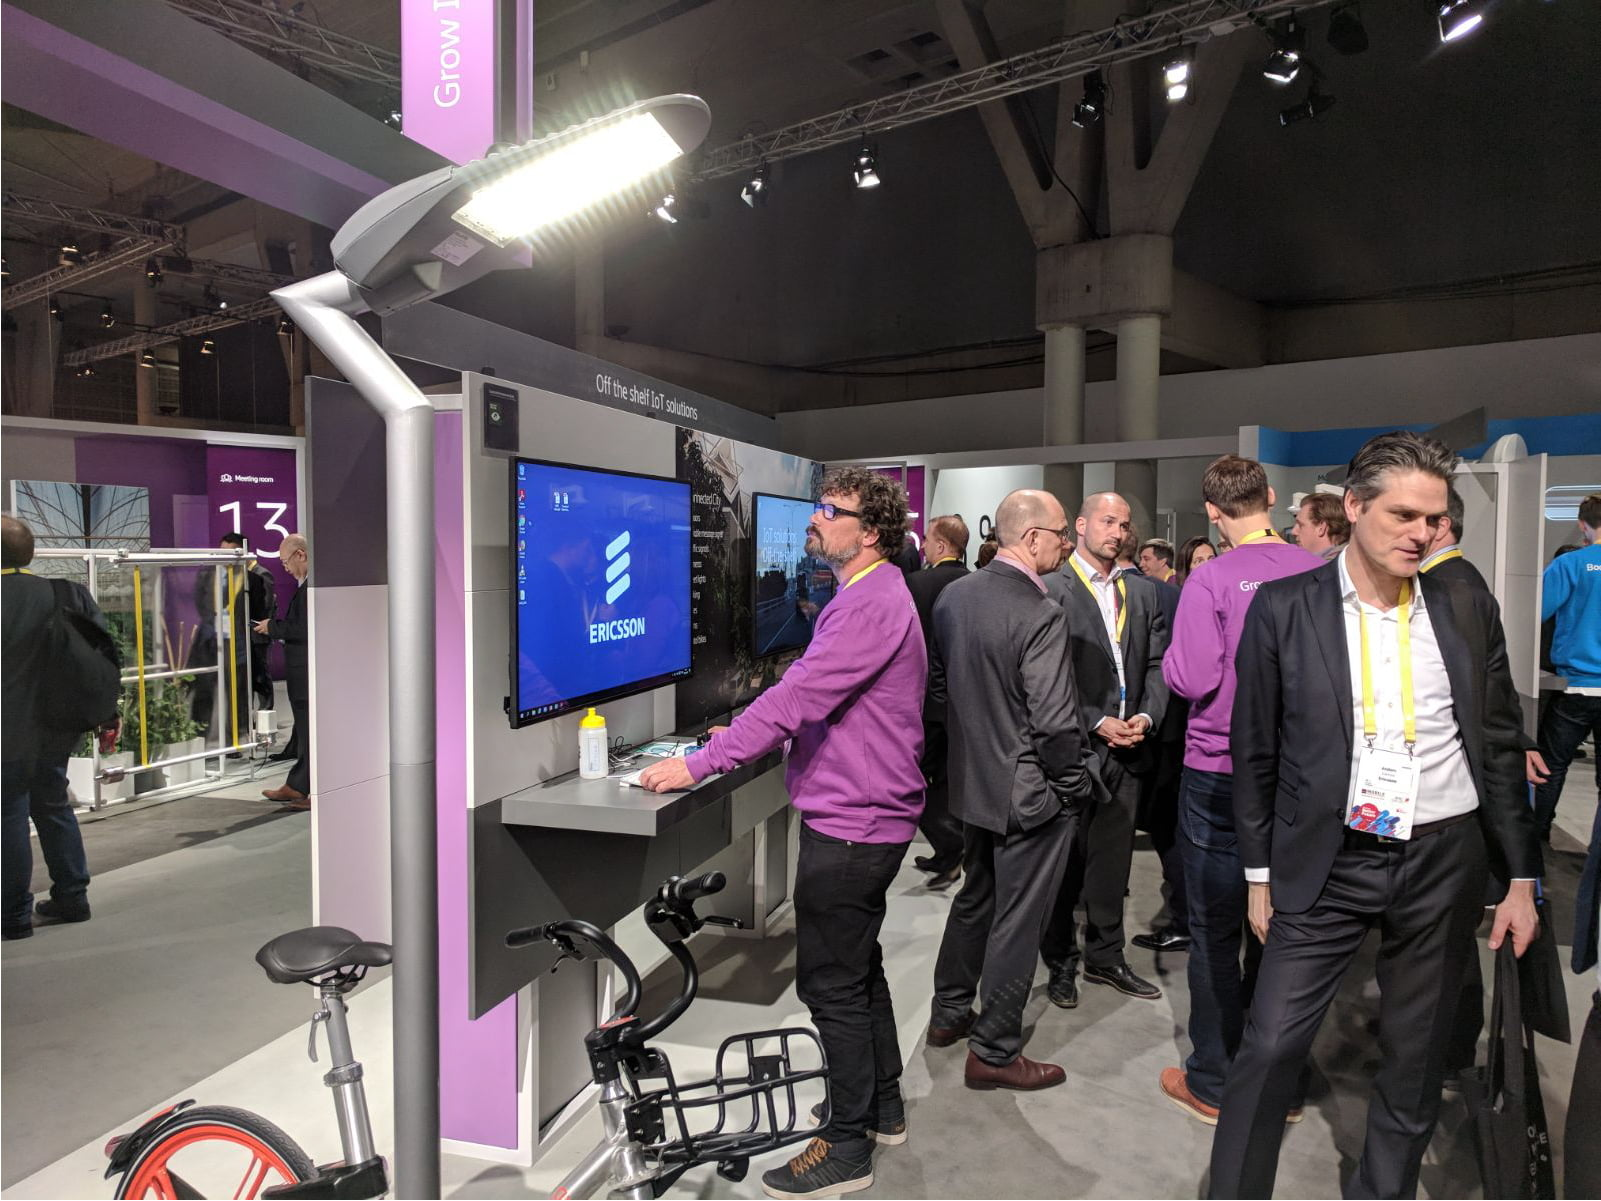 inteliLIGHT streetlight control solution during Mobile World Congress 2018_Ericsson